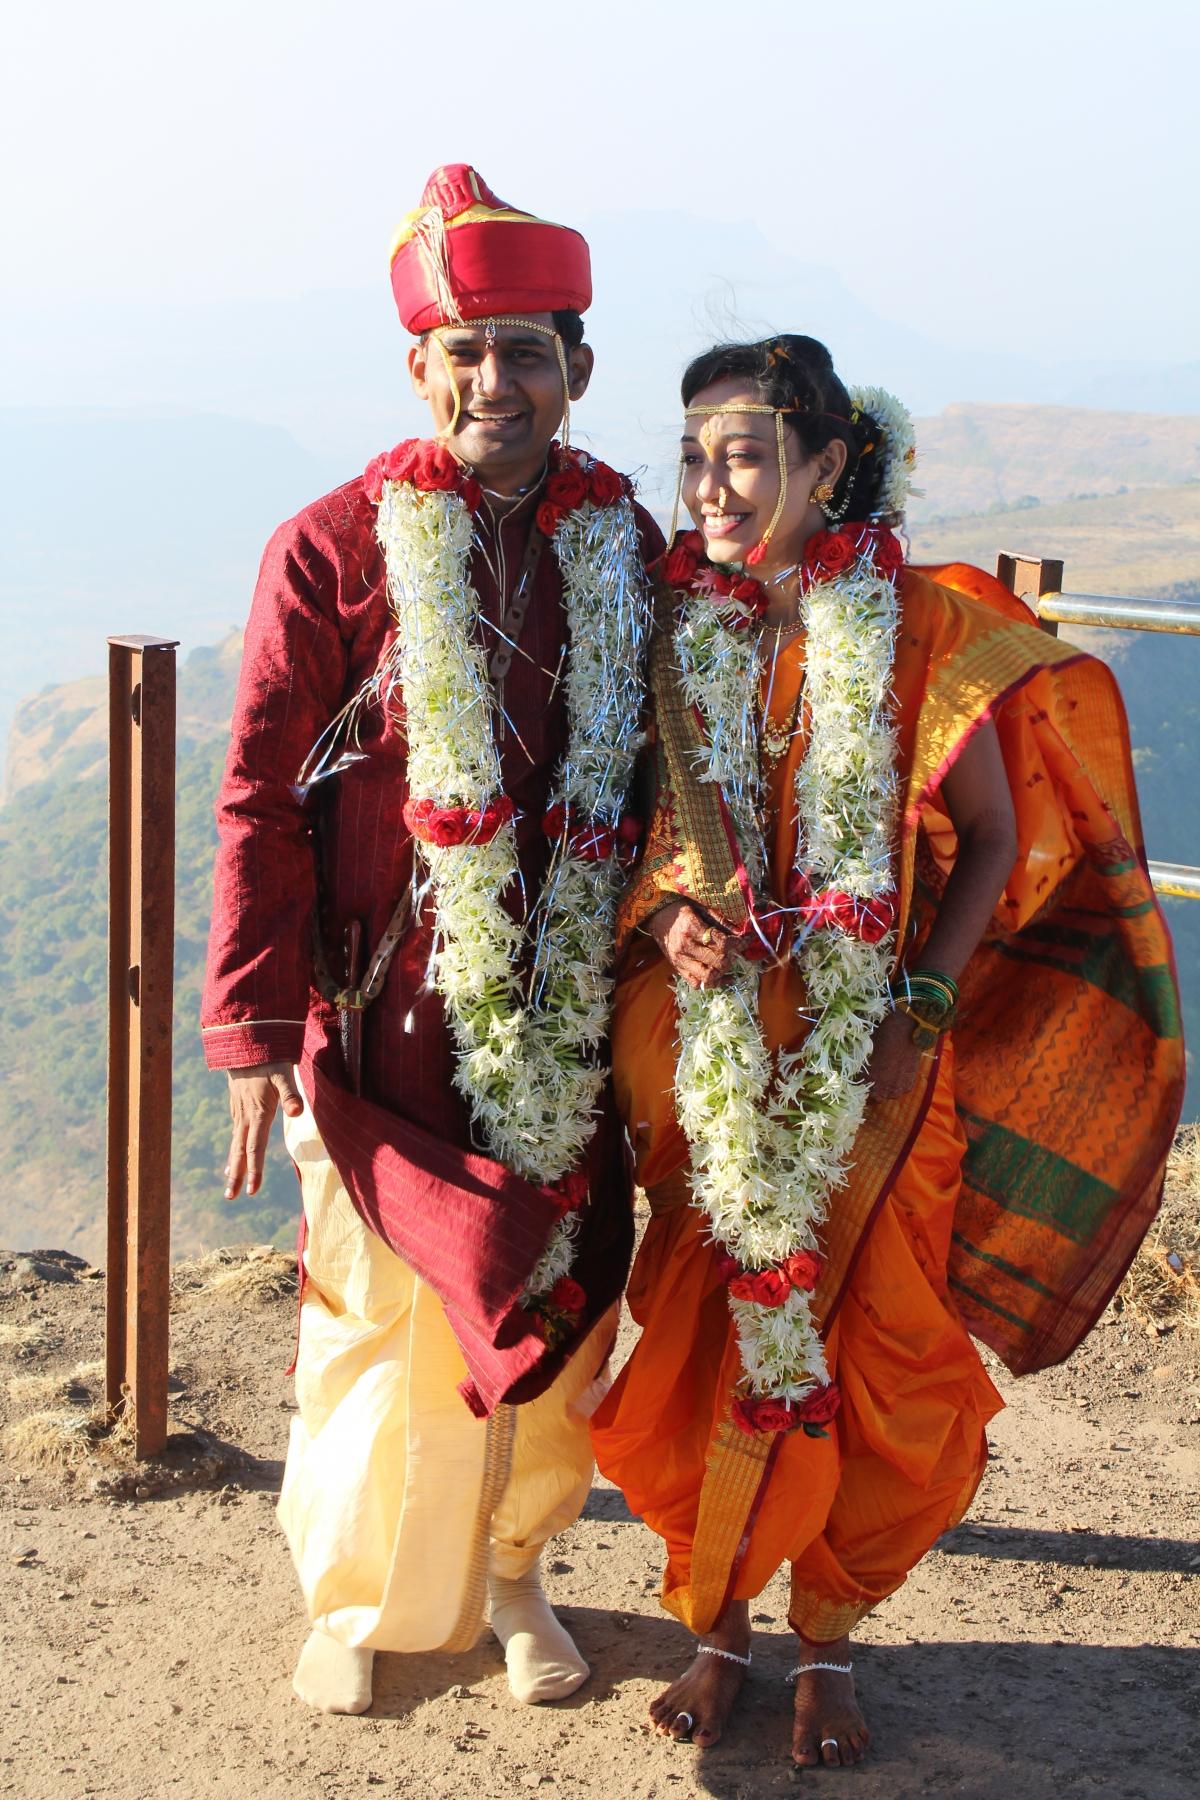 Axis Auto Group >> Unusual Wedding: Couple Marries on Top of Maharashtra's Tallest Peak Mt Kalsubai [PHOTOS ...